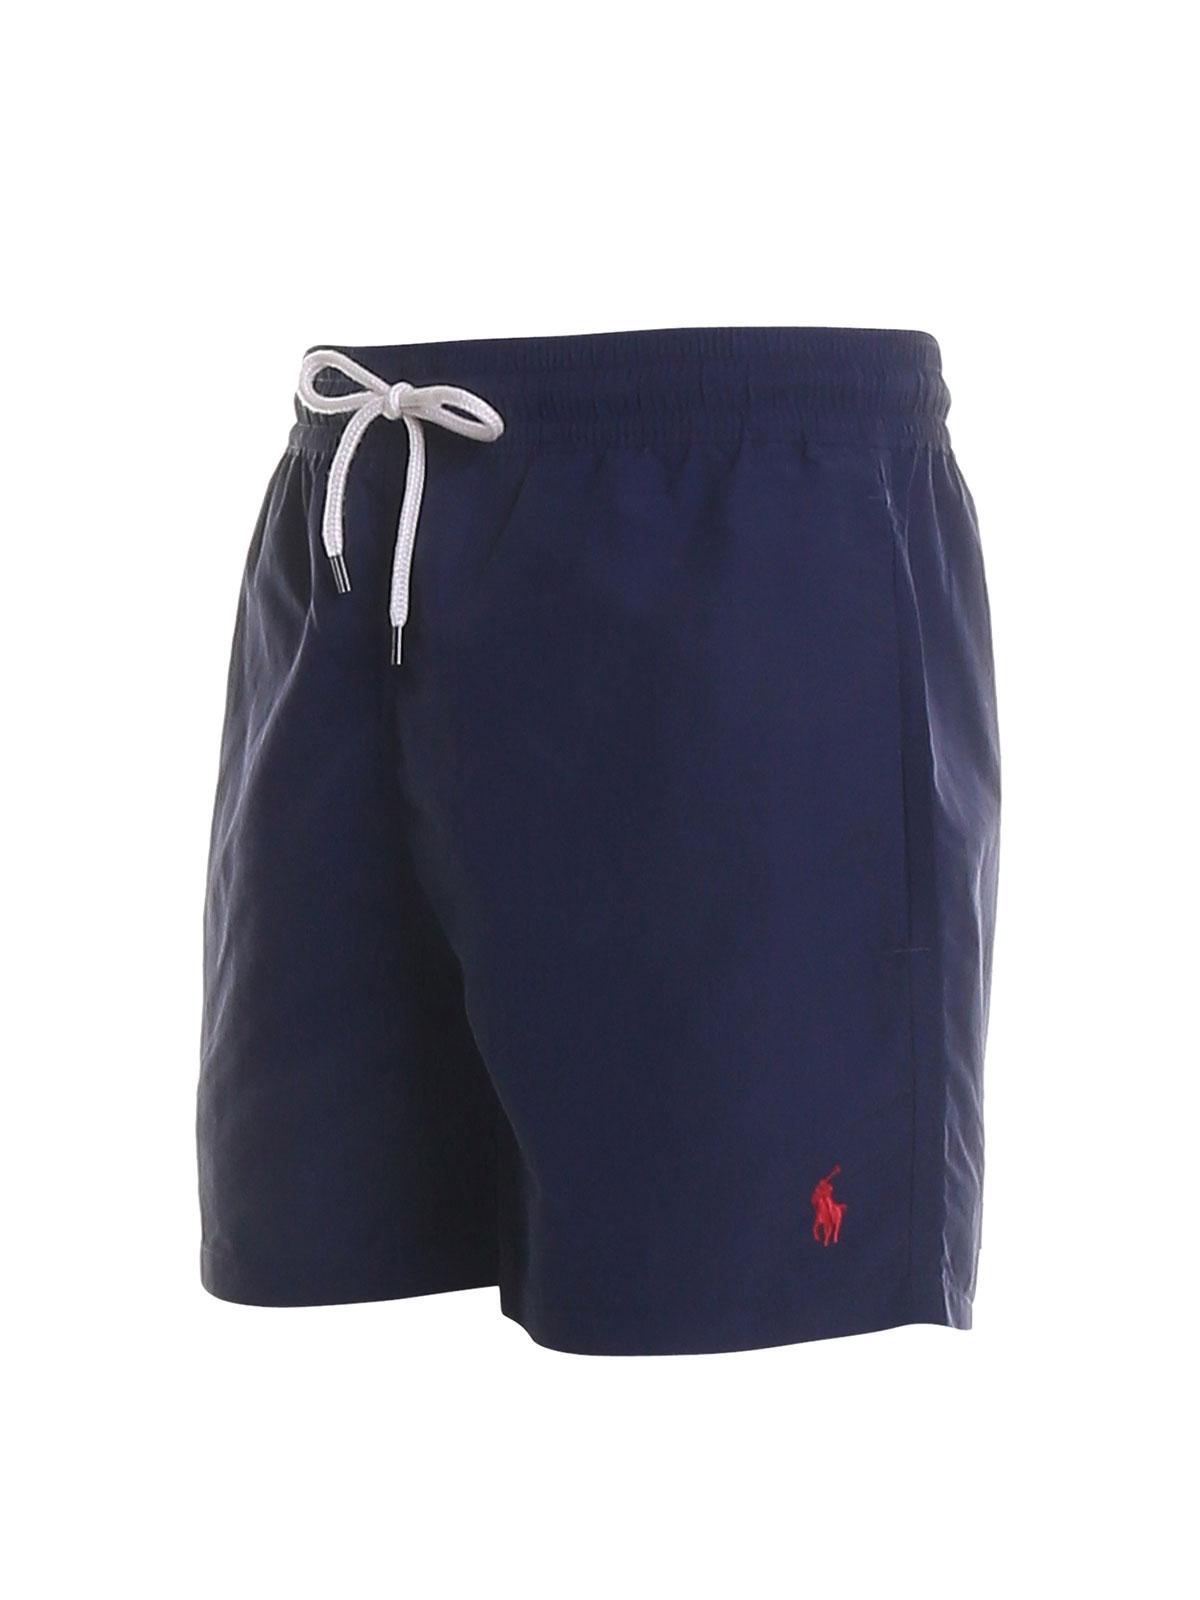 Picture of POLO RALPH LAUREN | Men's Nylon Swim Shorts